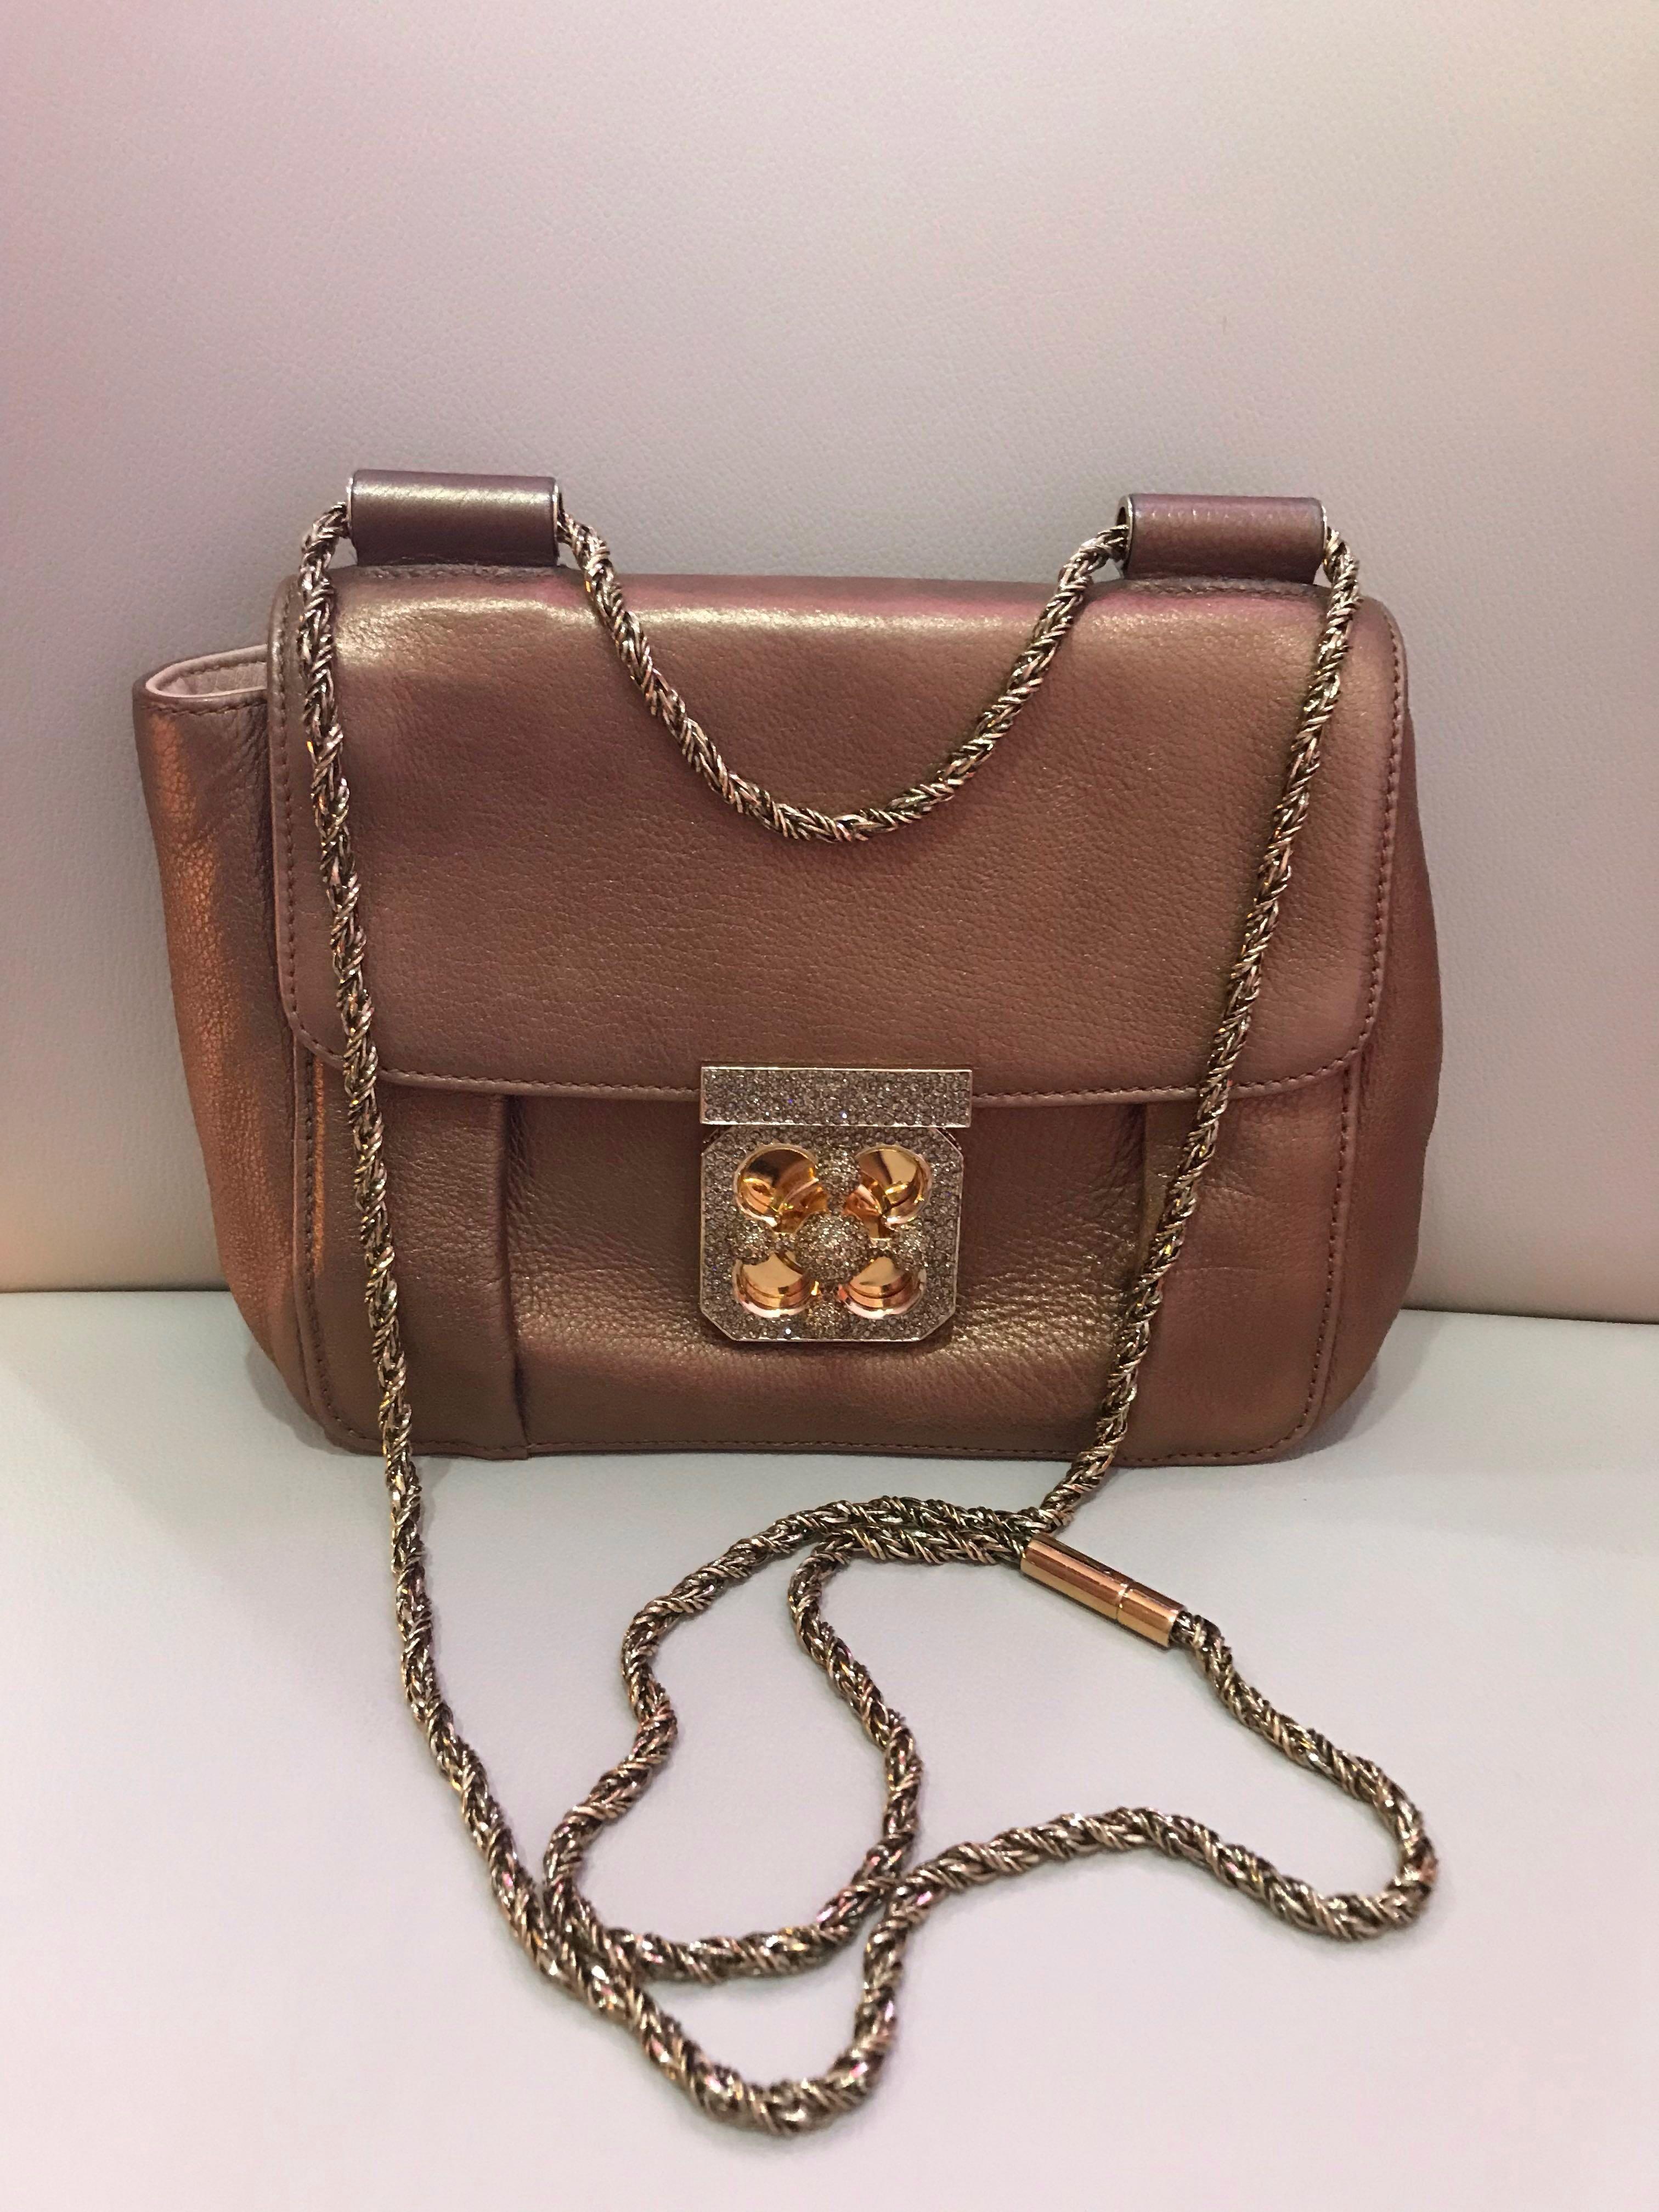 82635a72a0b Home · Luxury · Bags   Wallets · Handbags. photo photo ...